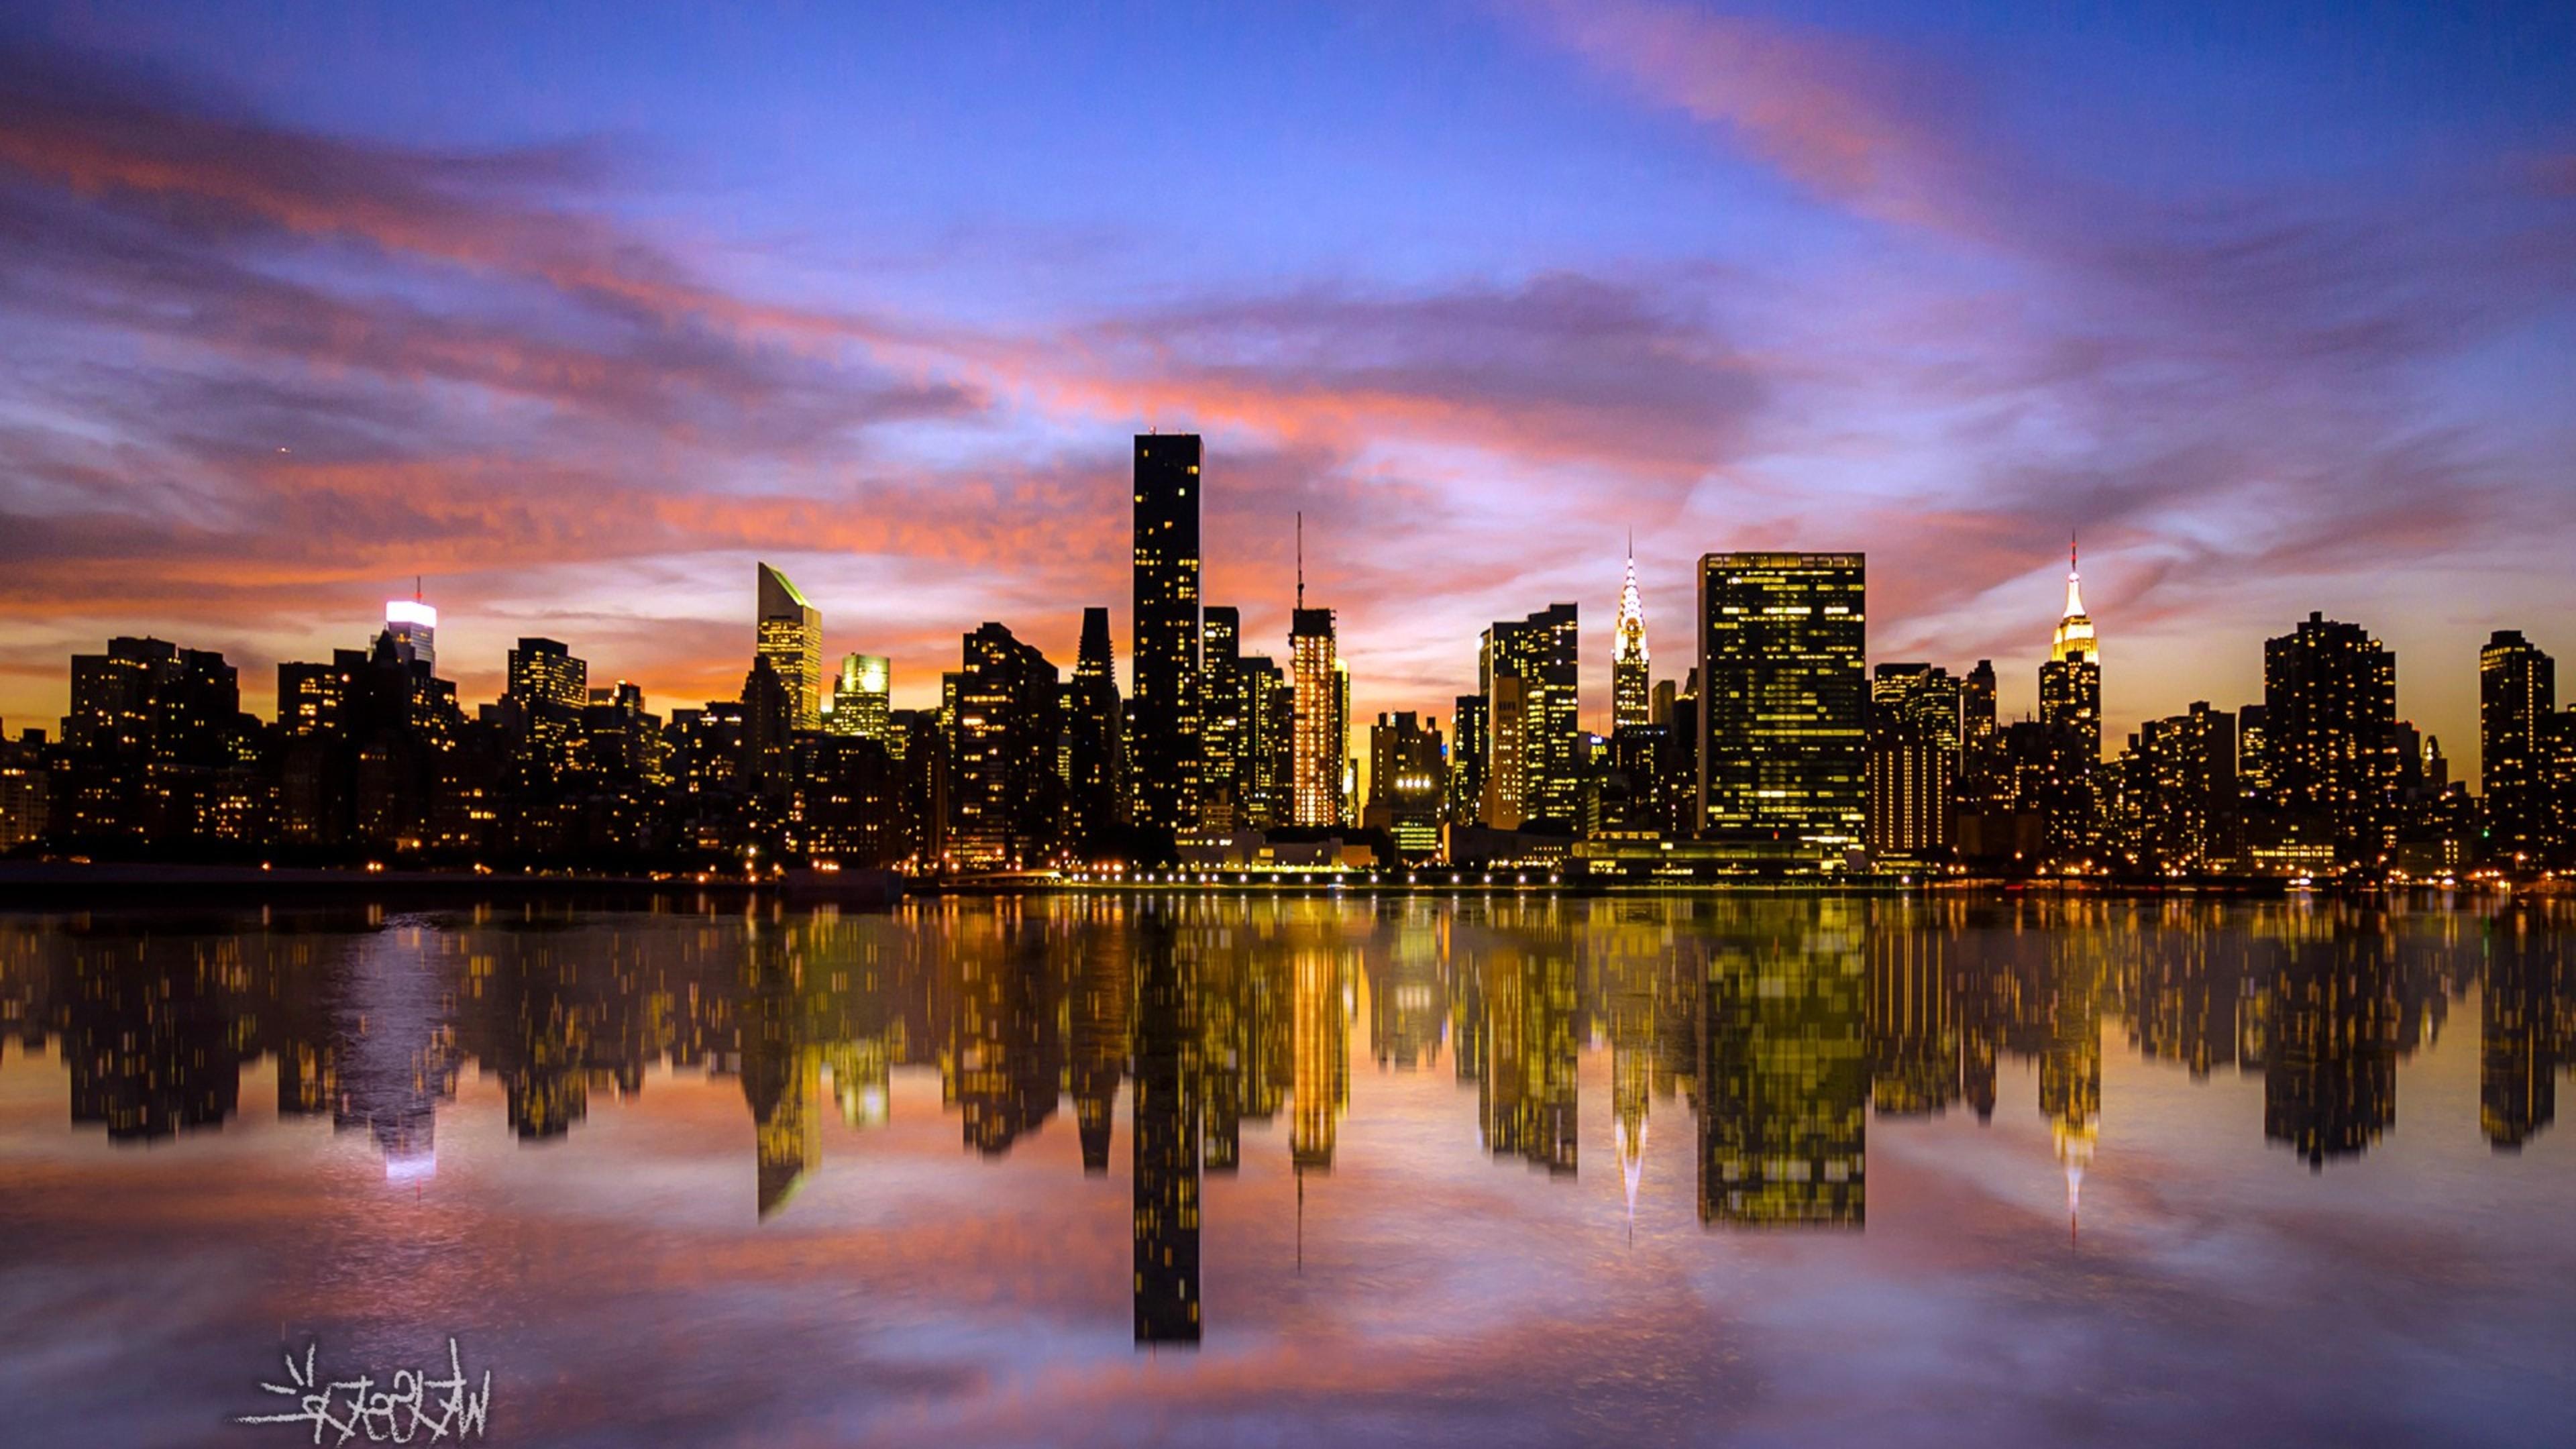 Beautiful Cars Hd Wallpapers Download Manhattan Sunset Desktop Hd World 4k Wallpapers Images